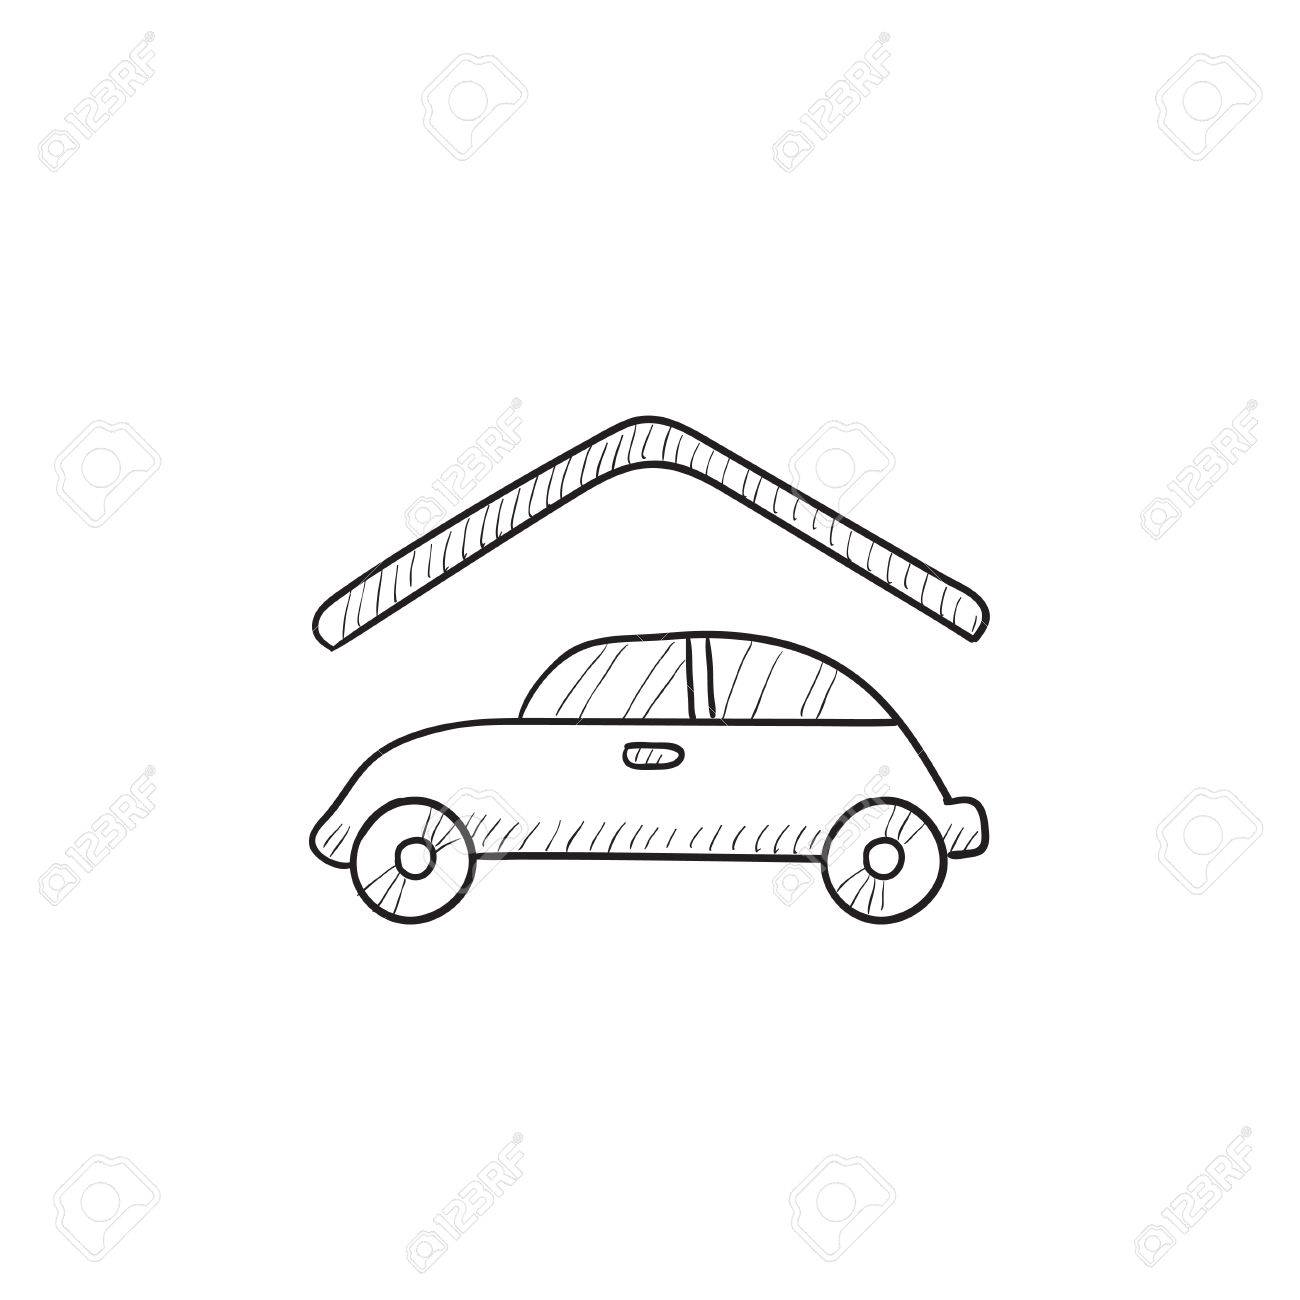 Berühmt Auto Skizze Website Bilder - Elektrische Schaltplan-Ideen ...